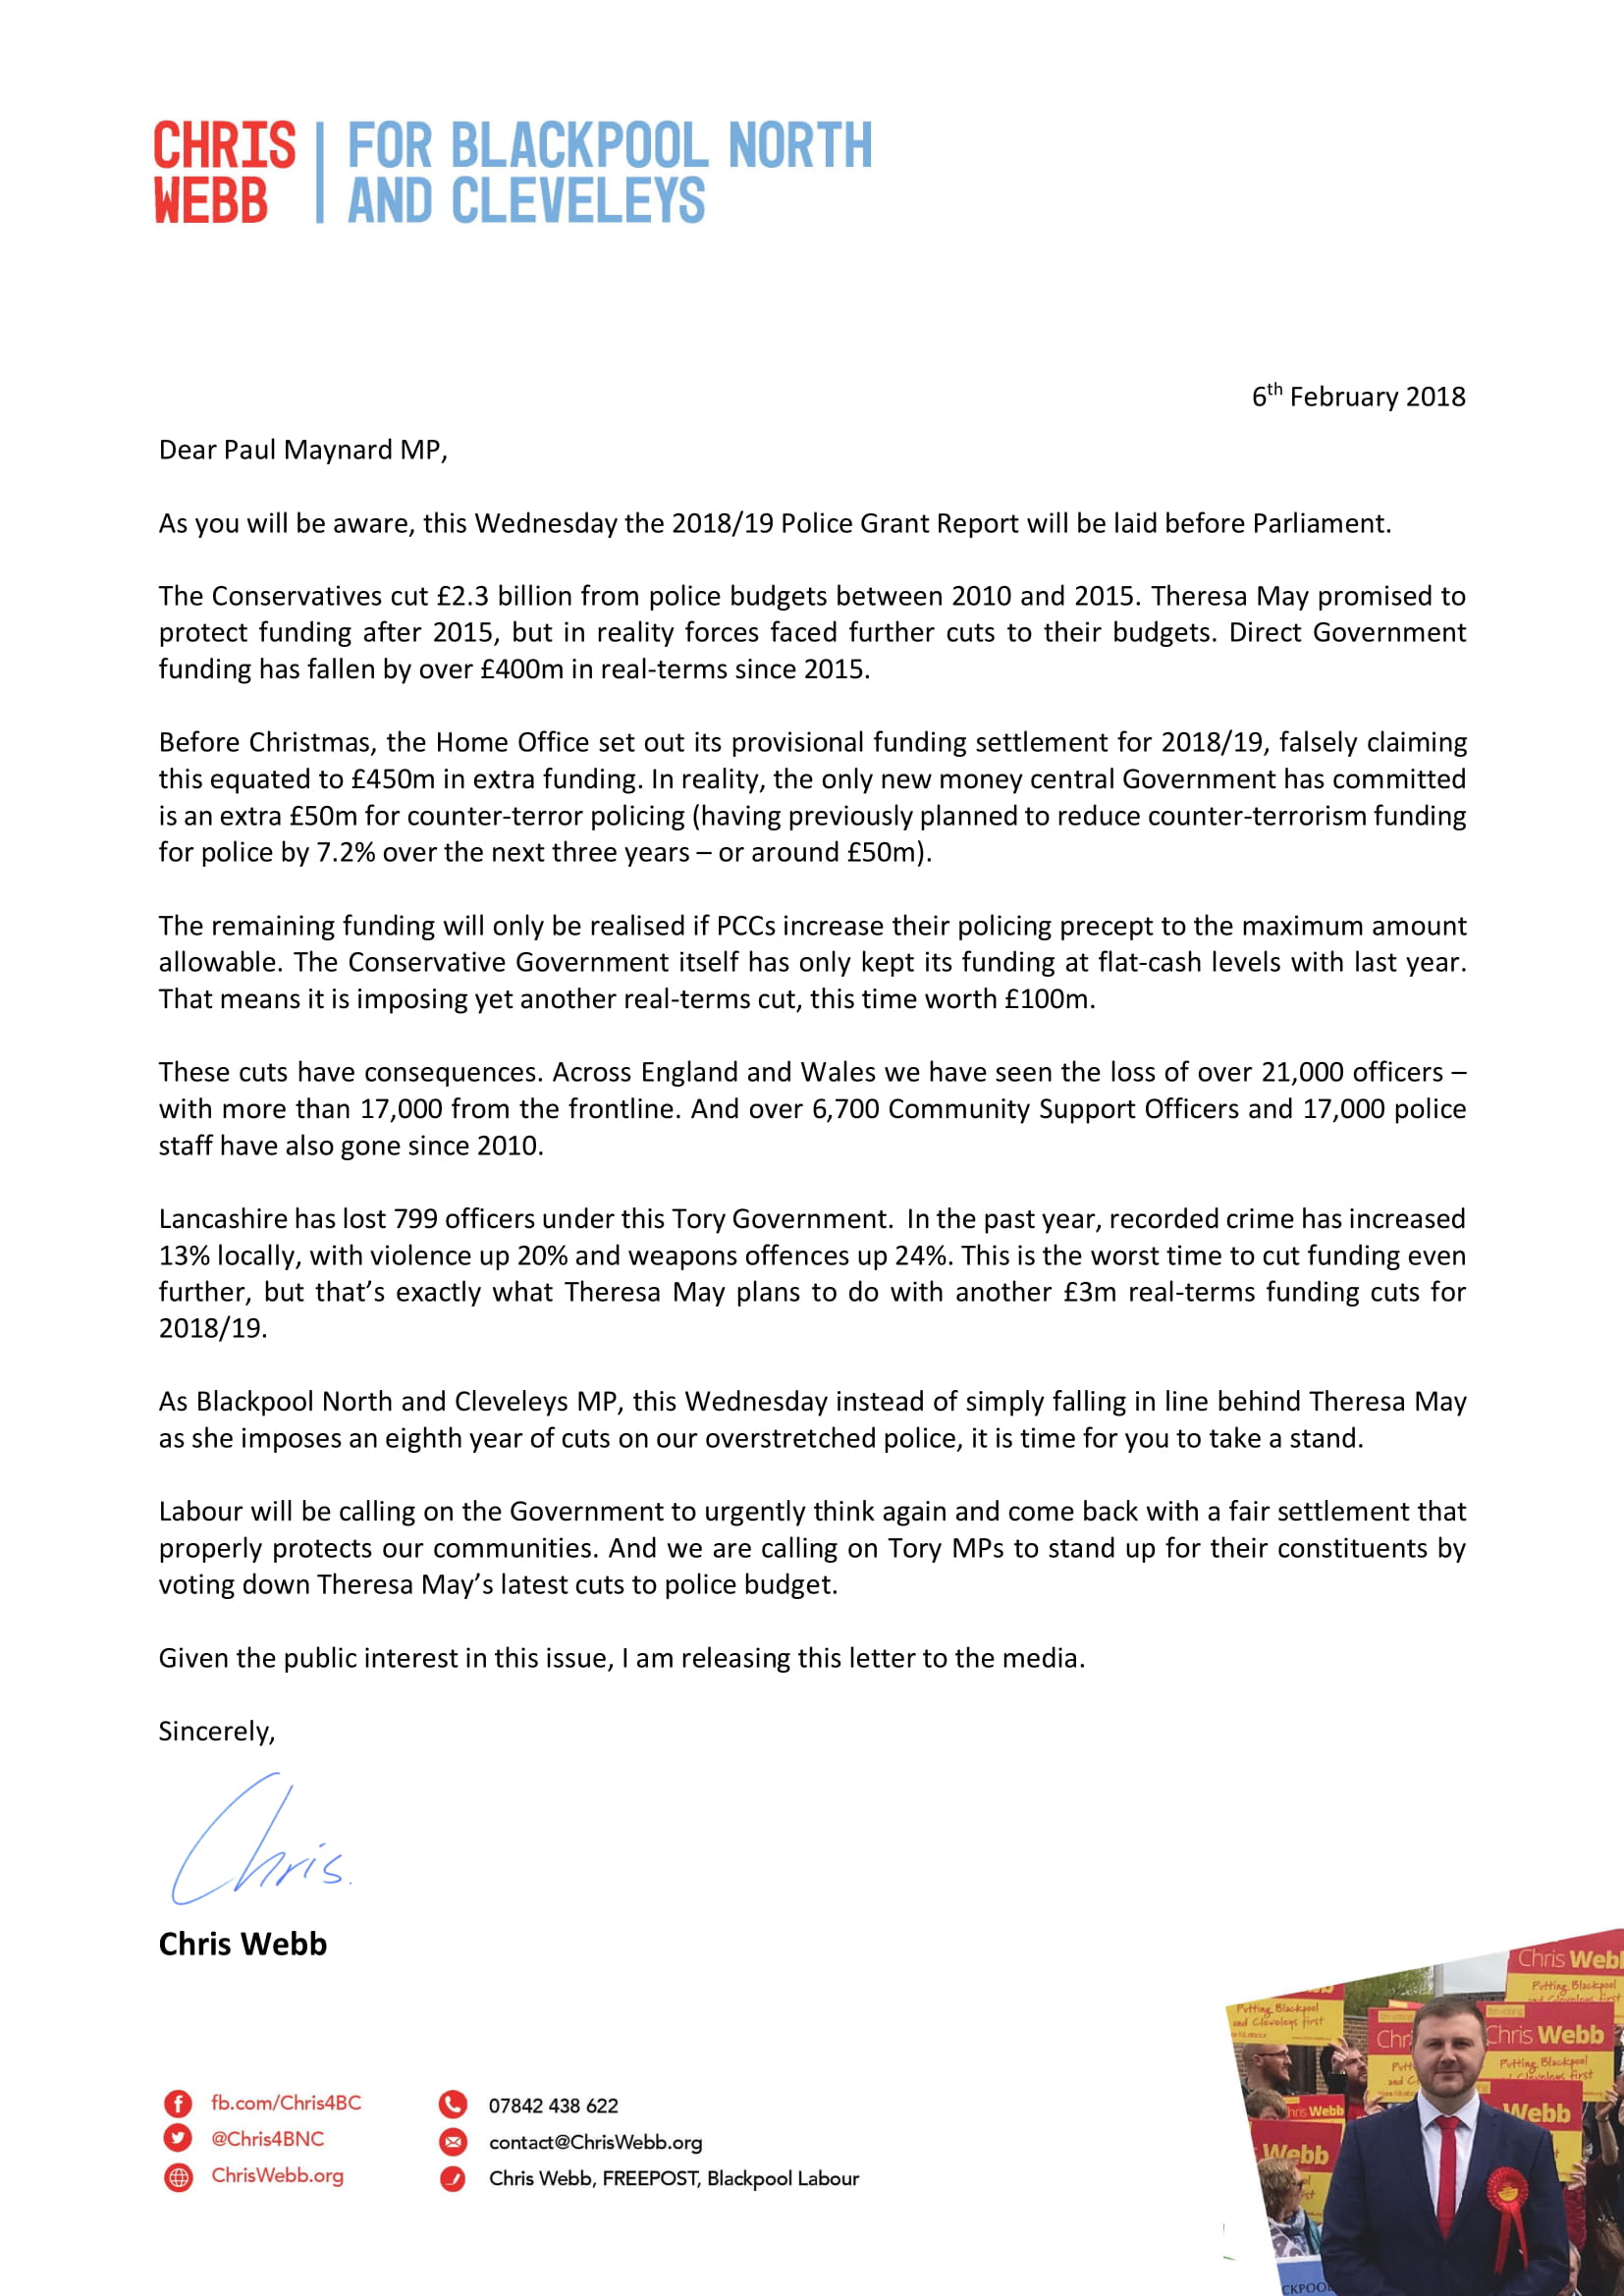 My letter to Paul Maynard MP regarding Police Funding